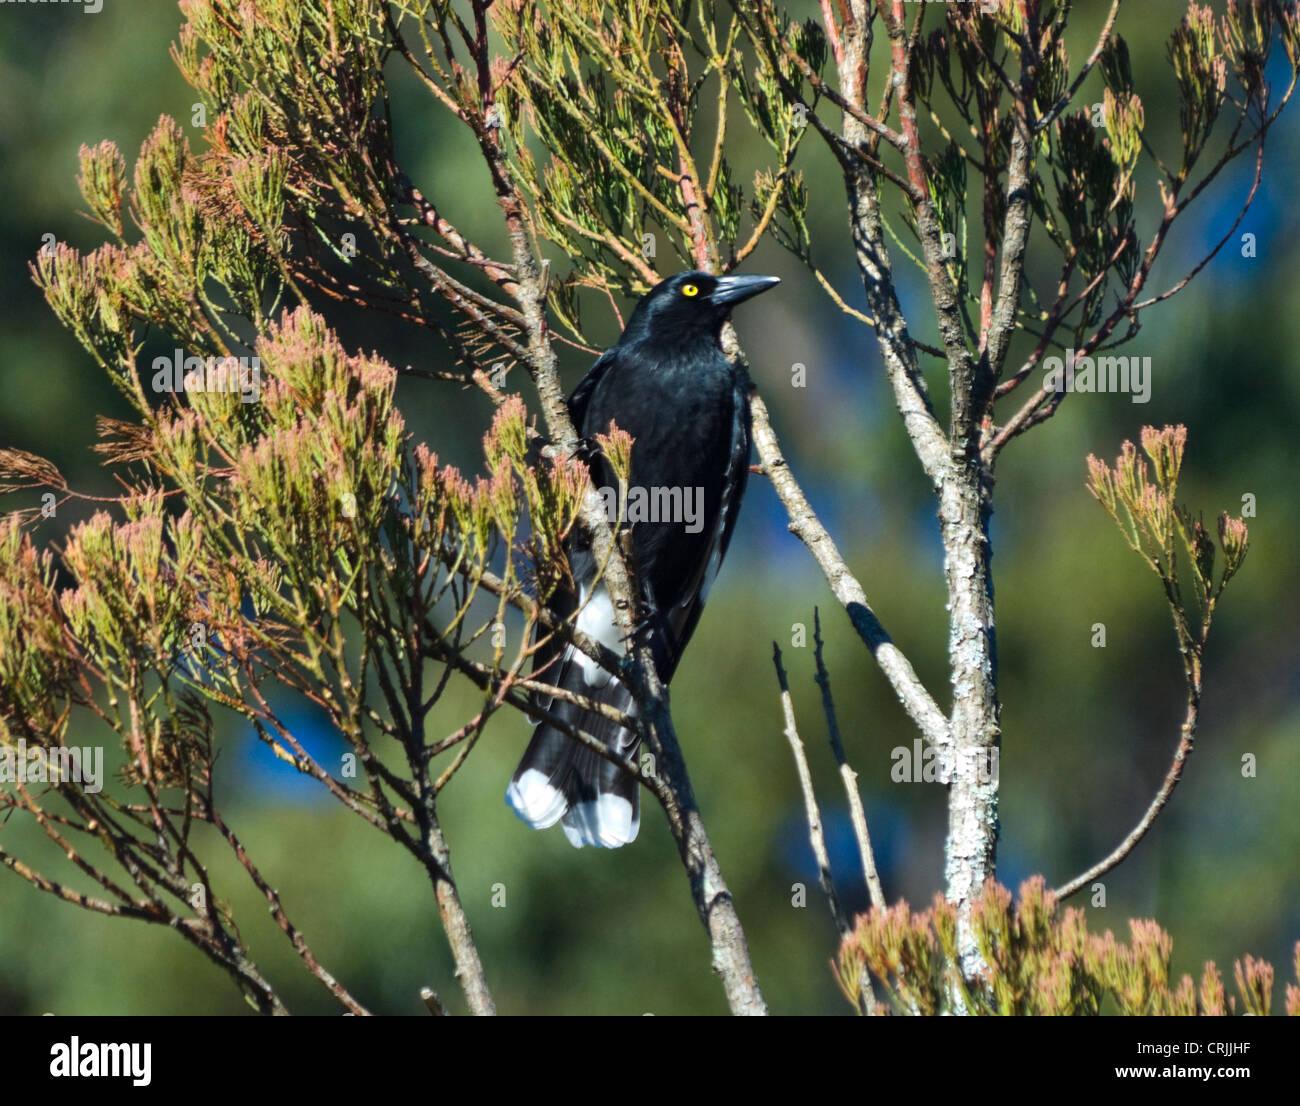 Pied Currawong (Strepera graculina) - Stock Image